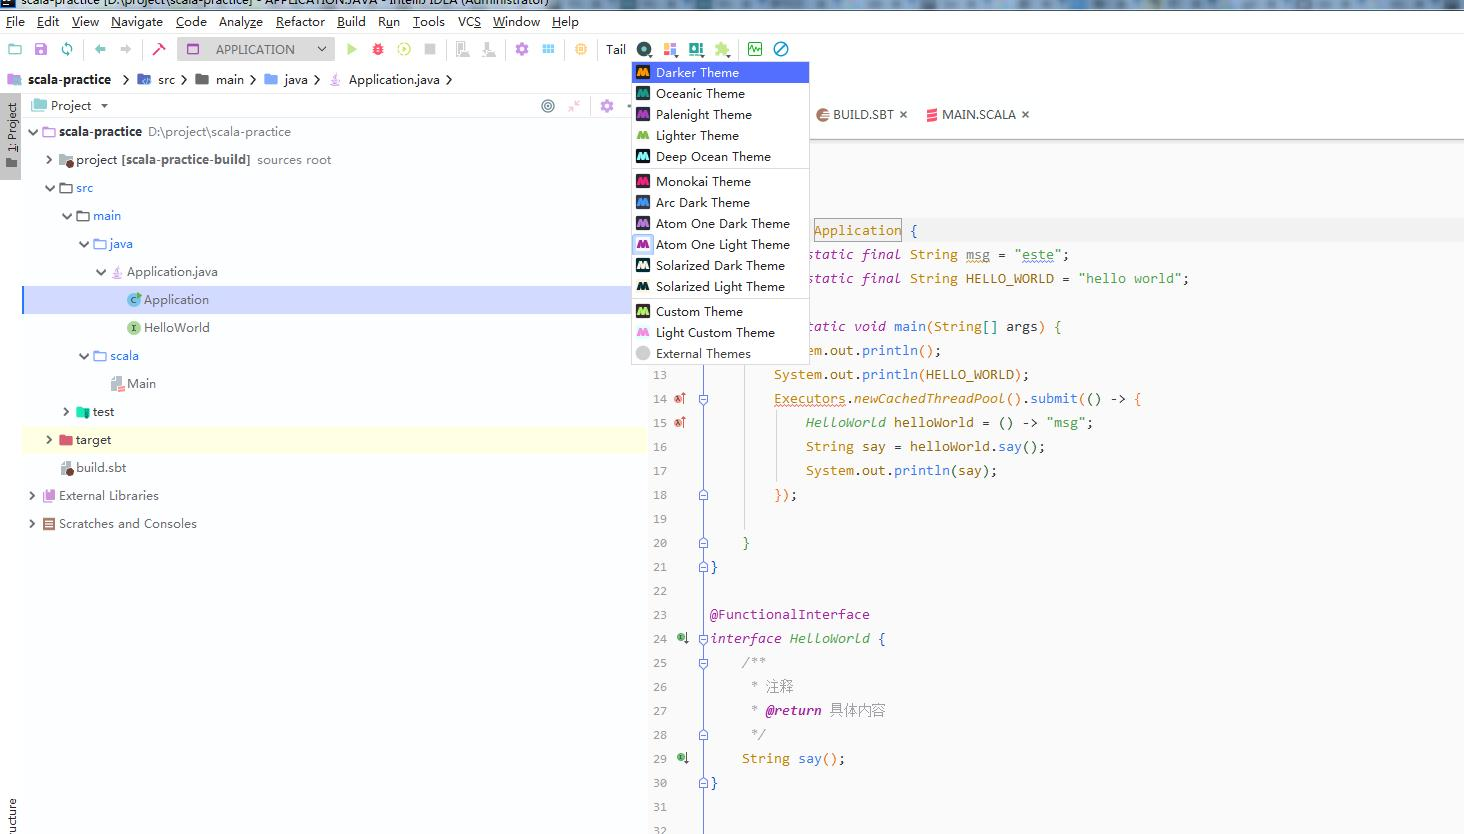 Intelij configuration upgrade - Programmer Sought